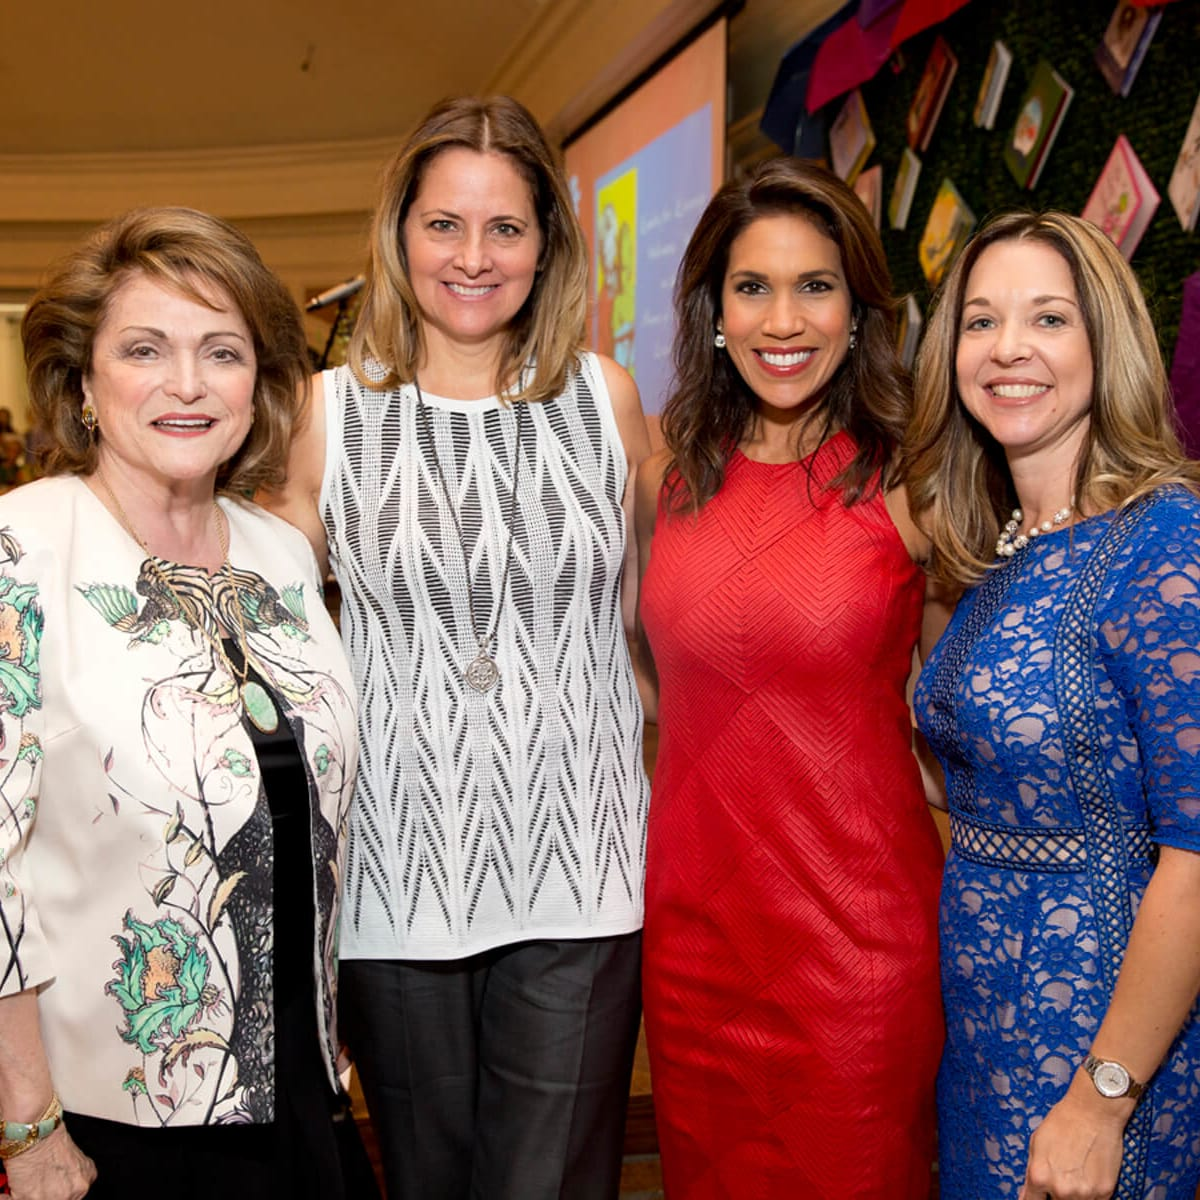 Ladies for Literacy, 9/16, Beth Wolff, Laurel D'Antoni, Rachel McNeill, Julie Baker Finck